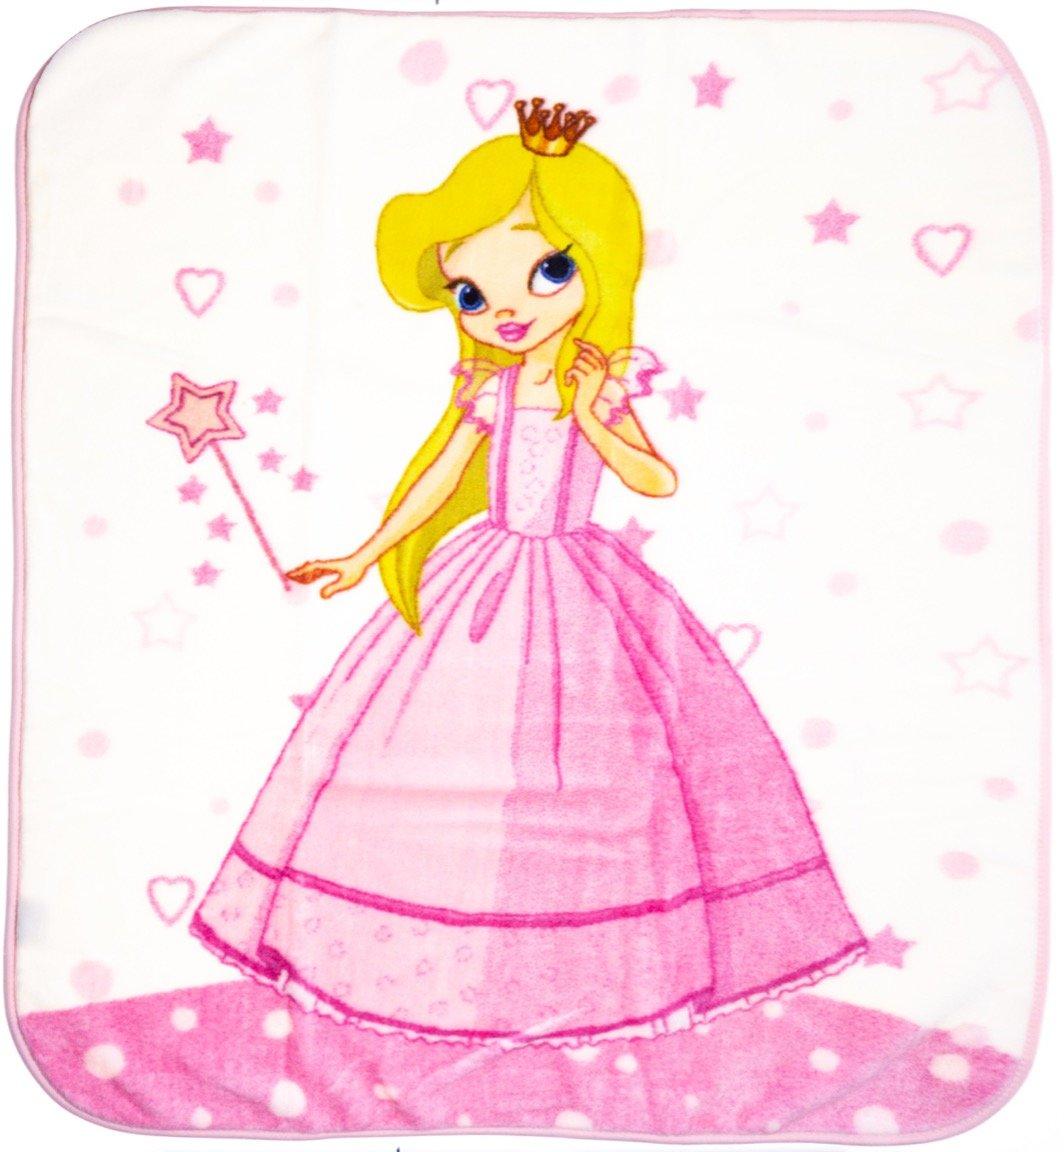 Pandora Baby κουβέρτα για παιδικό κρεβάτι (κούνια) «Princess»